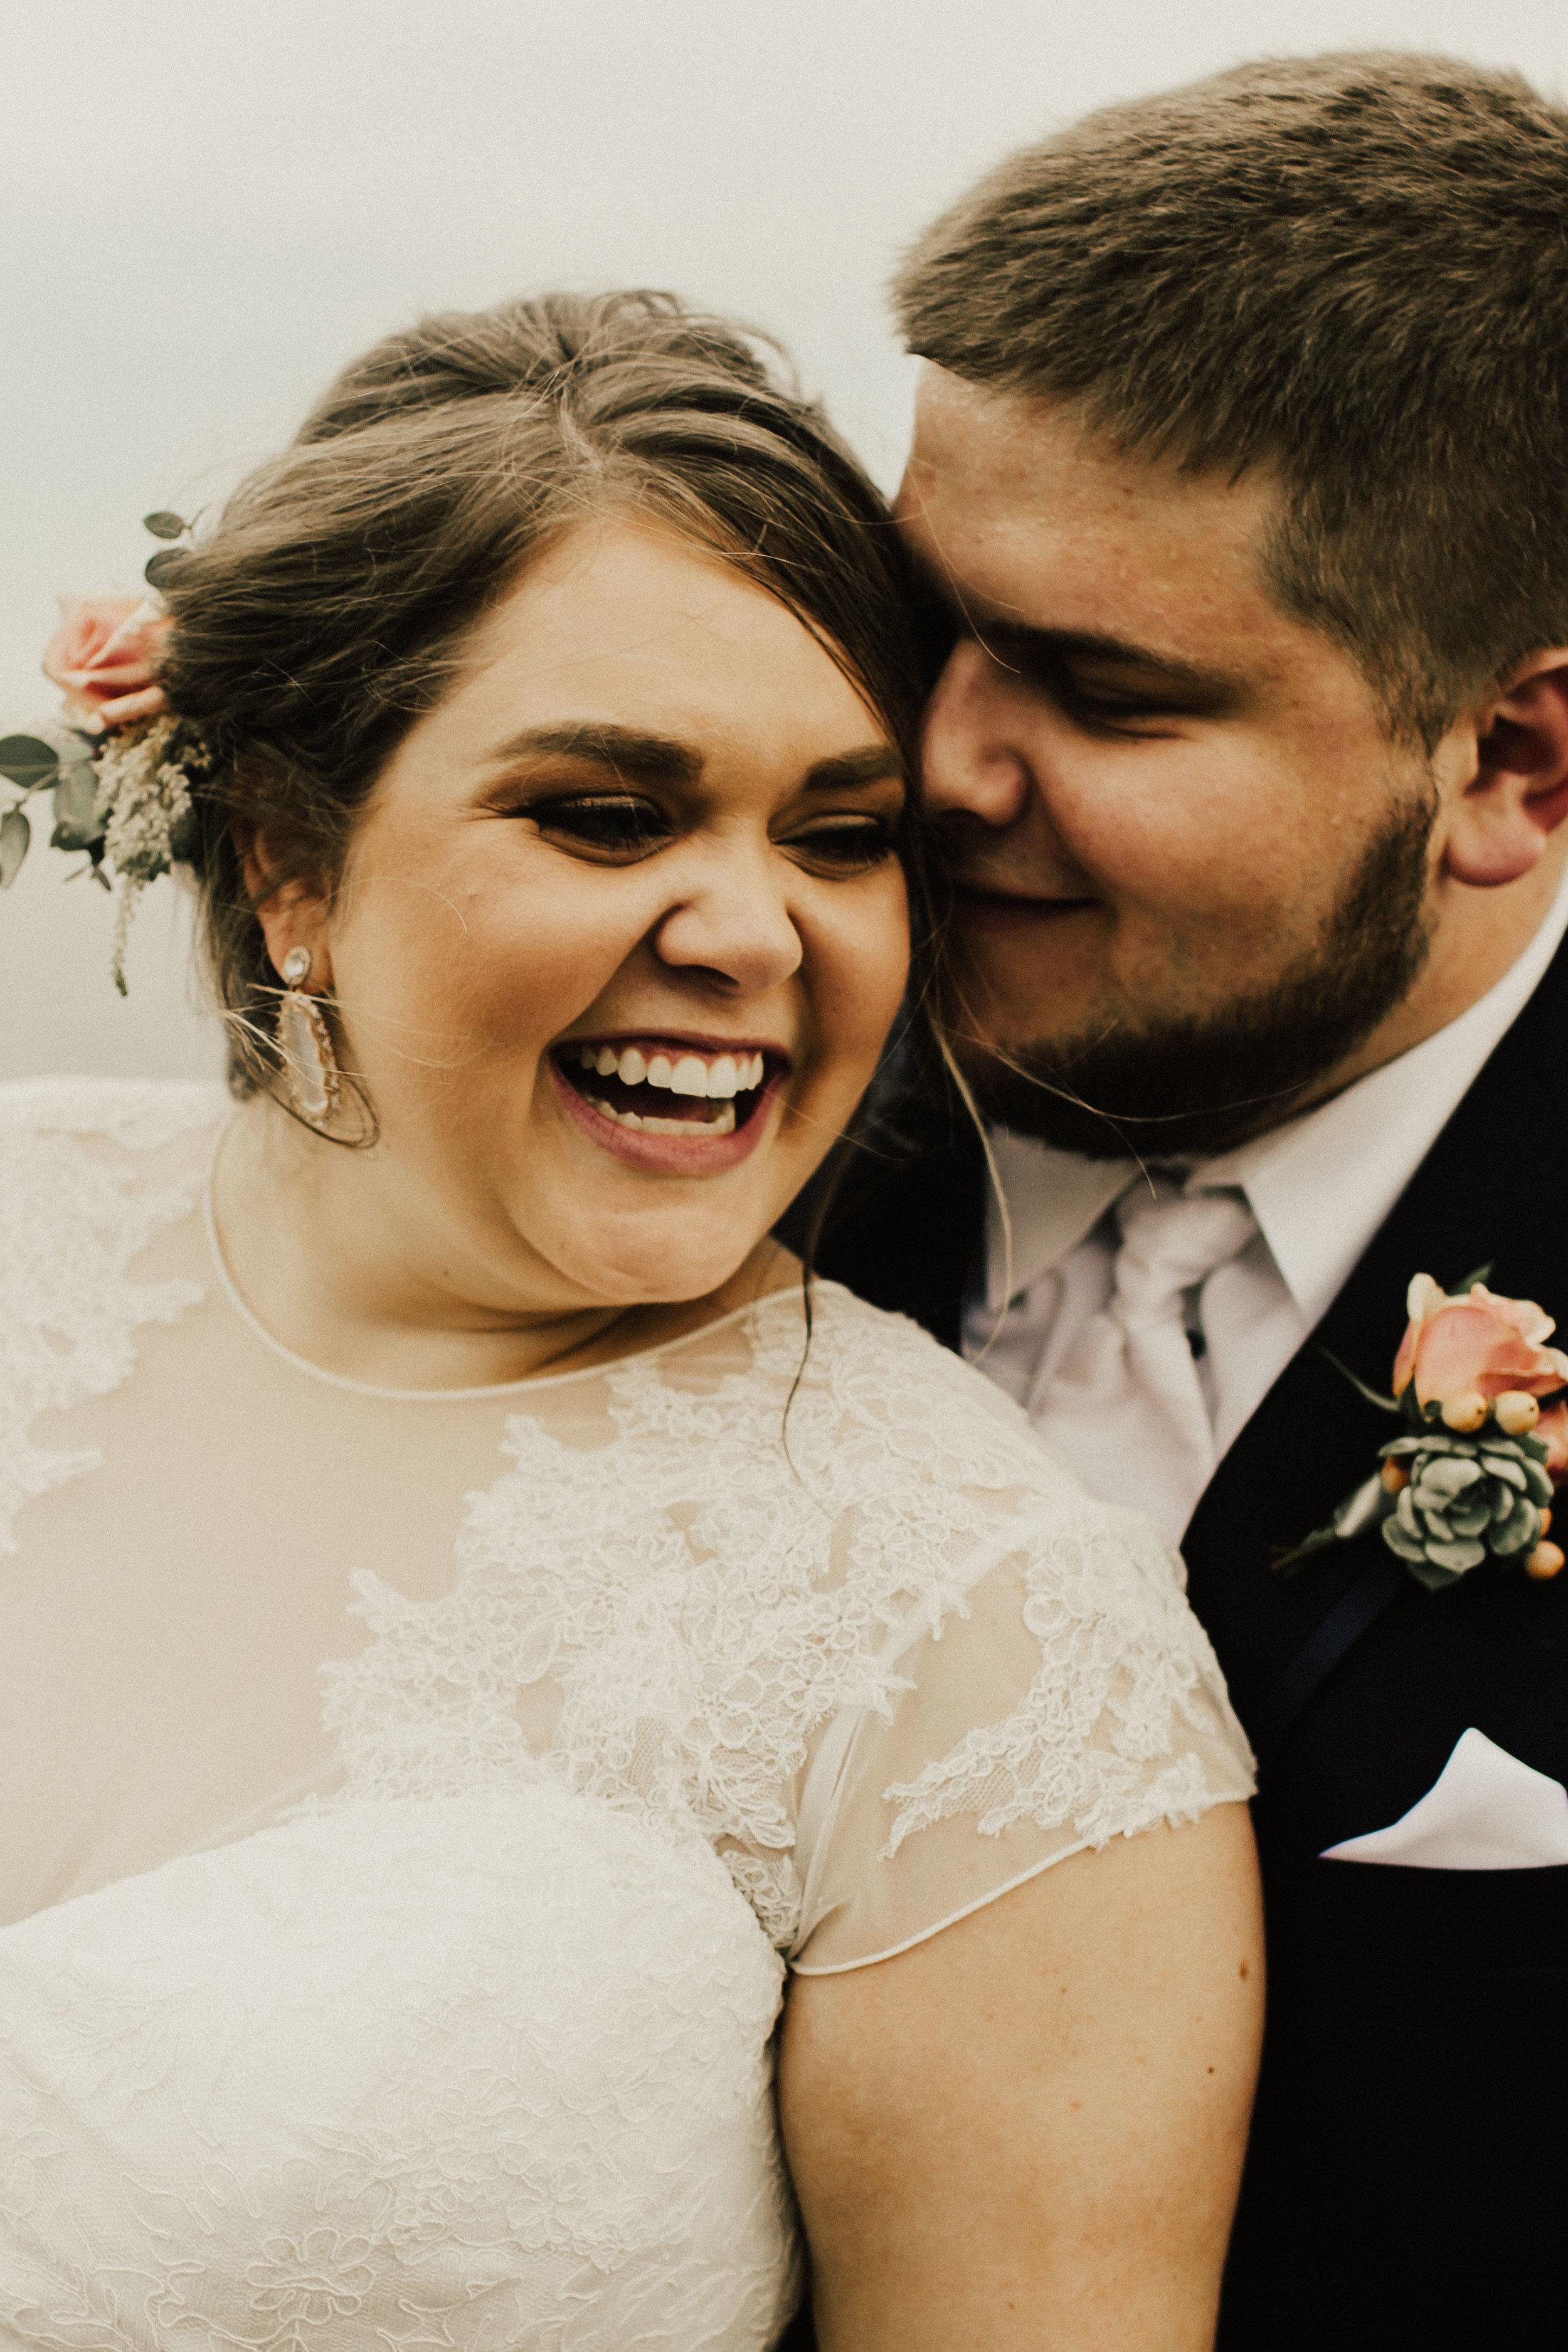 caitlin-jackson-wedding-photographer-lake-tyler-petroleum-club-texas--602.jpg